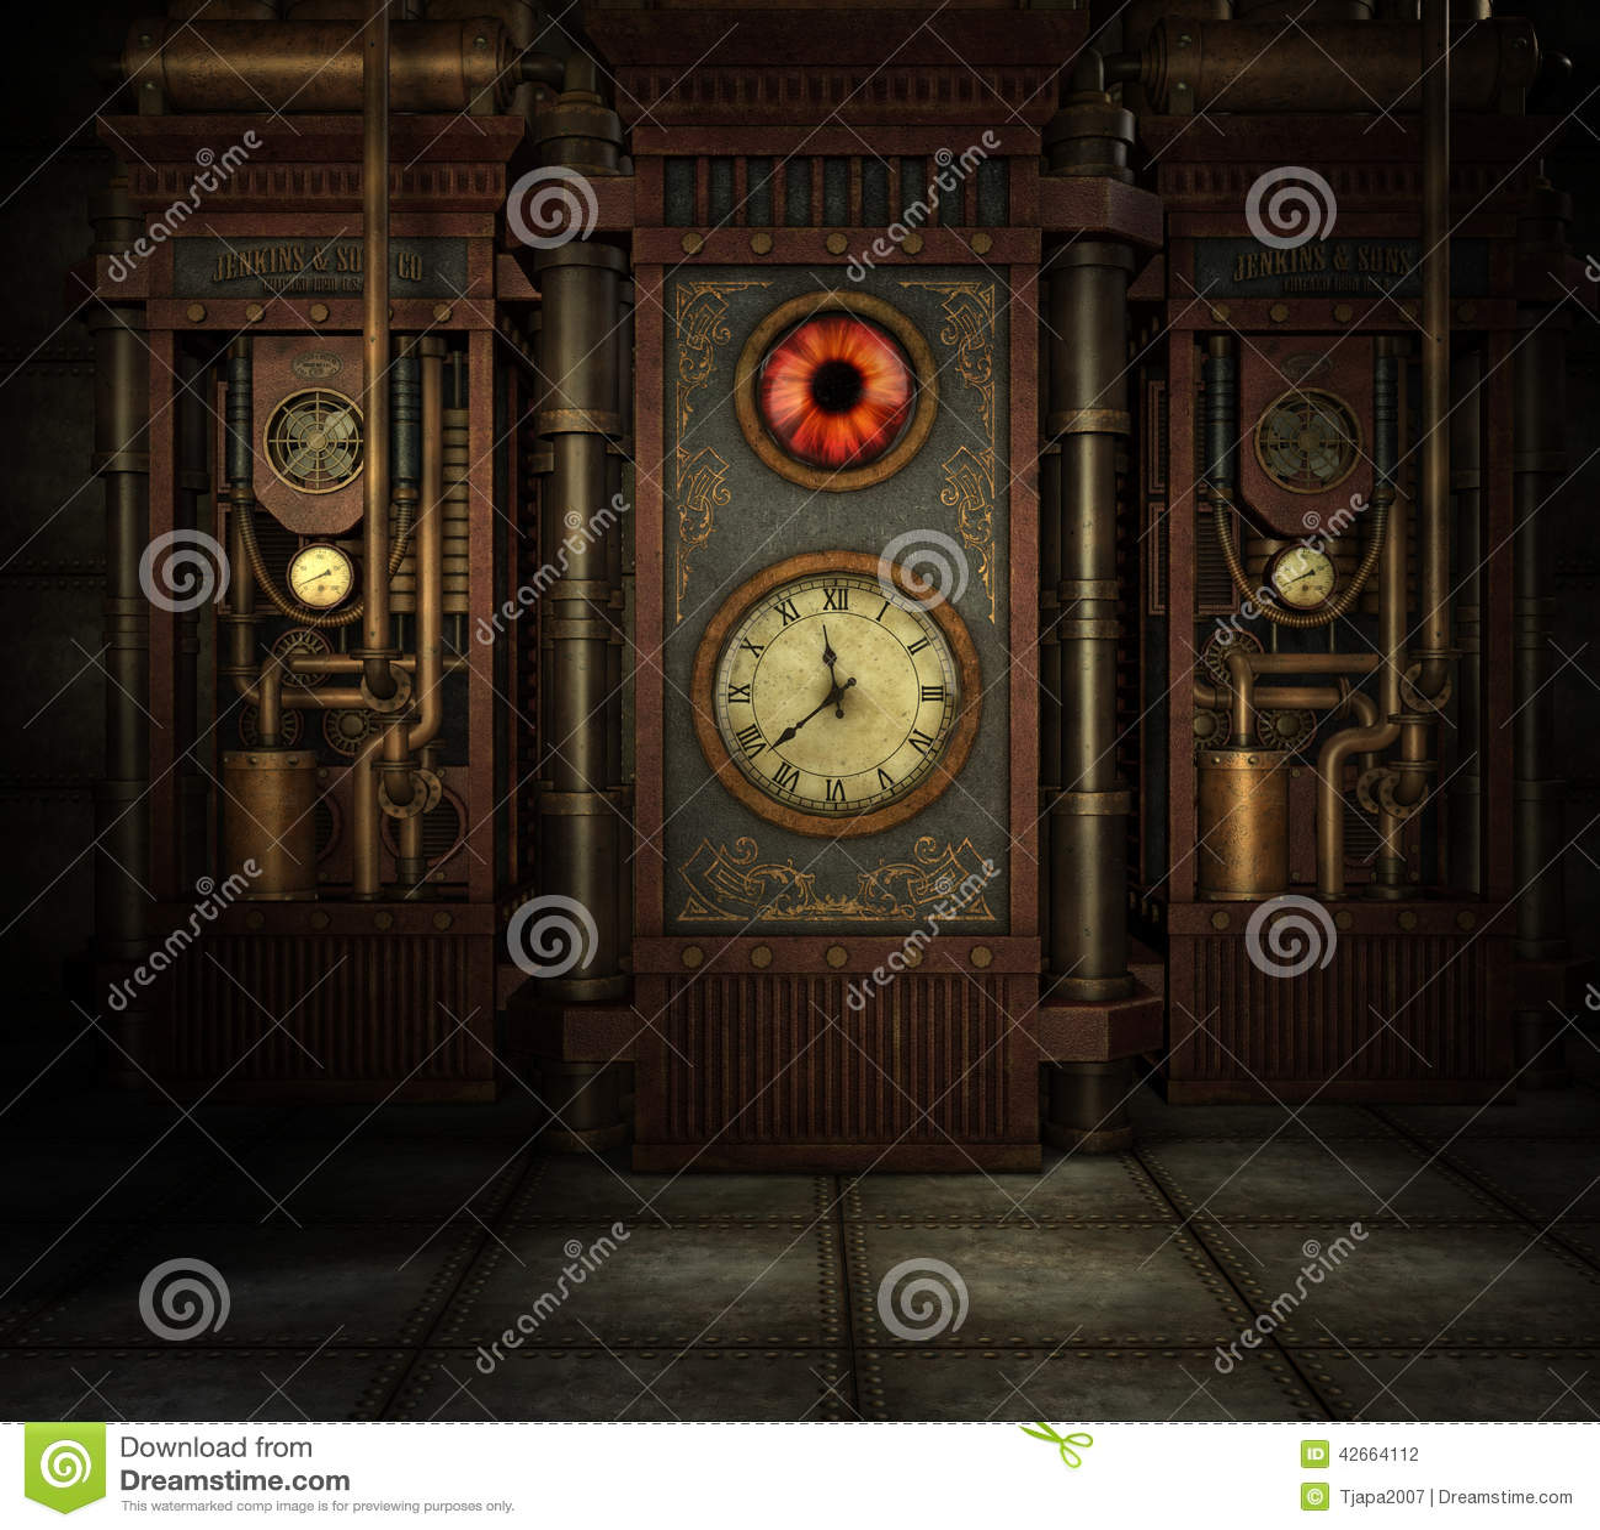 Steampunk Time Stock Photo Cartoondealer Com 83302386